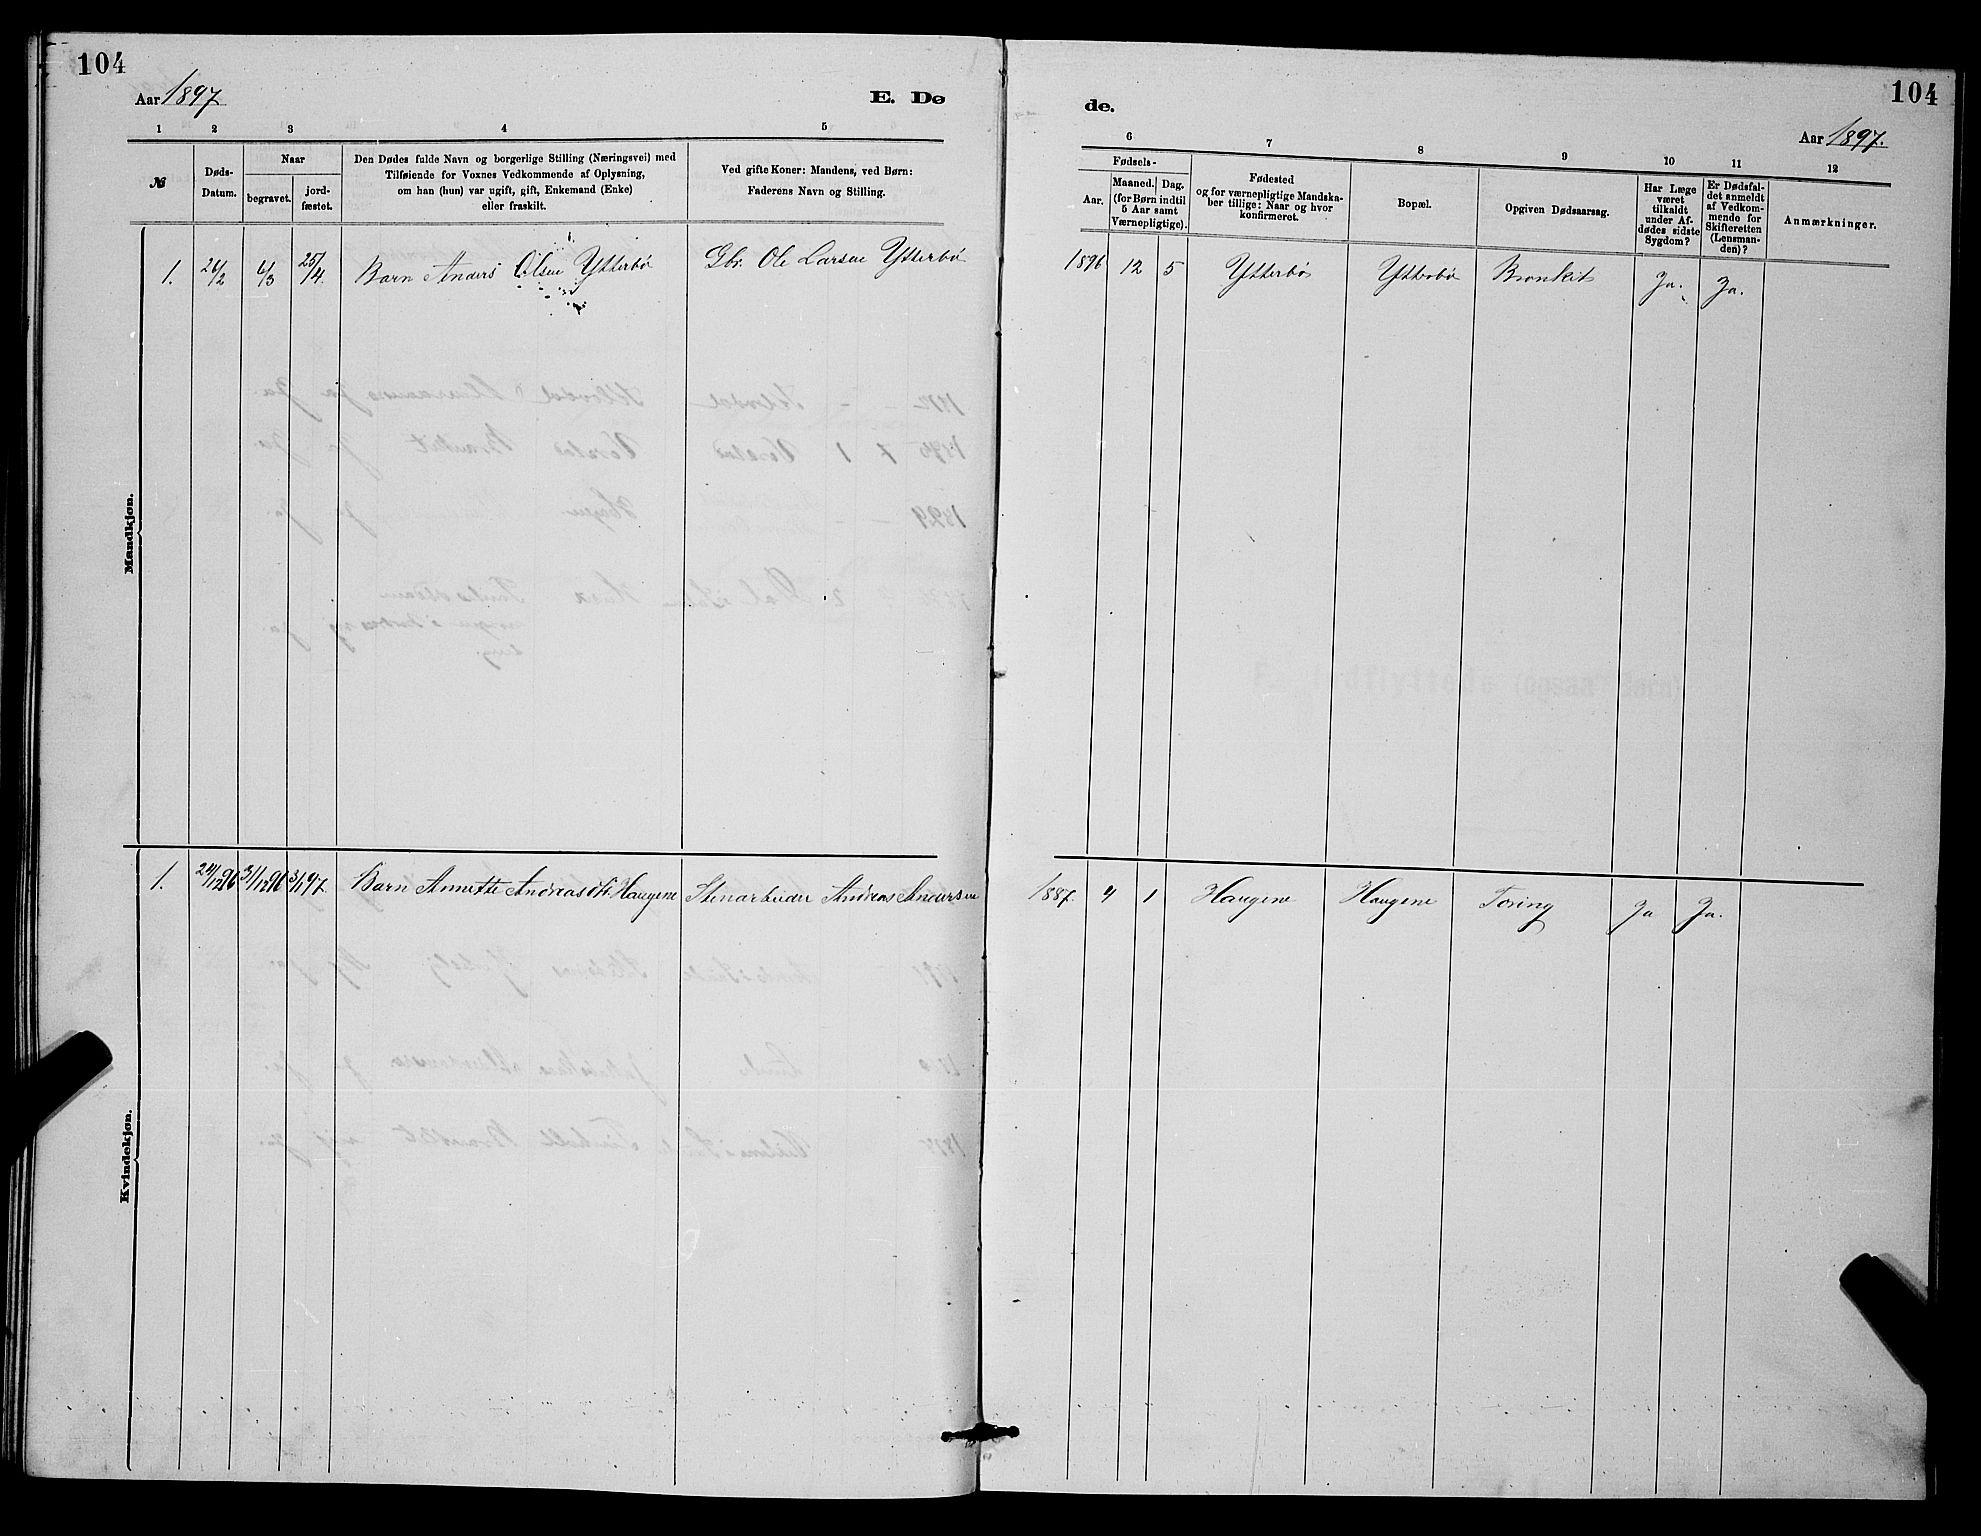 SAKO, Holla kirkebøker, G/Gb/L0001: Klokkerbok nr. II 1, 1882-1897, s. 104